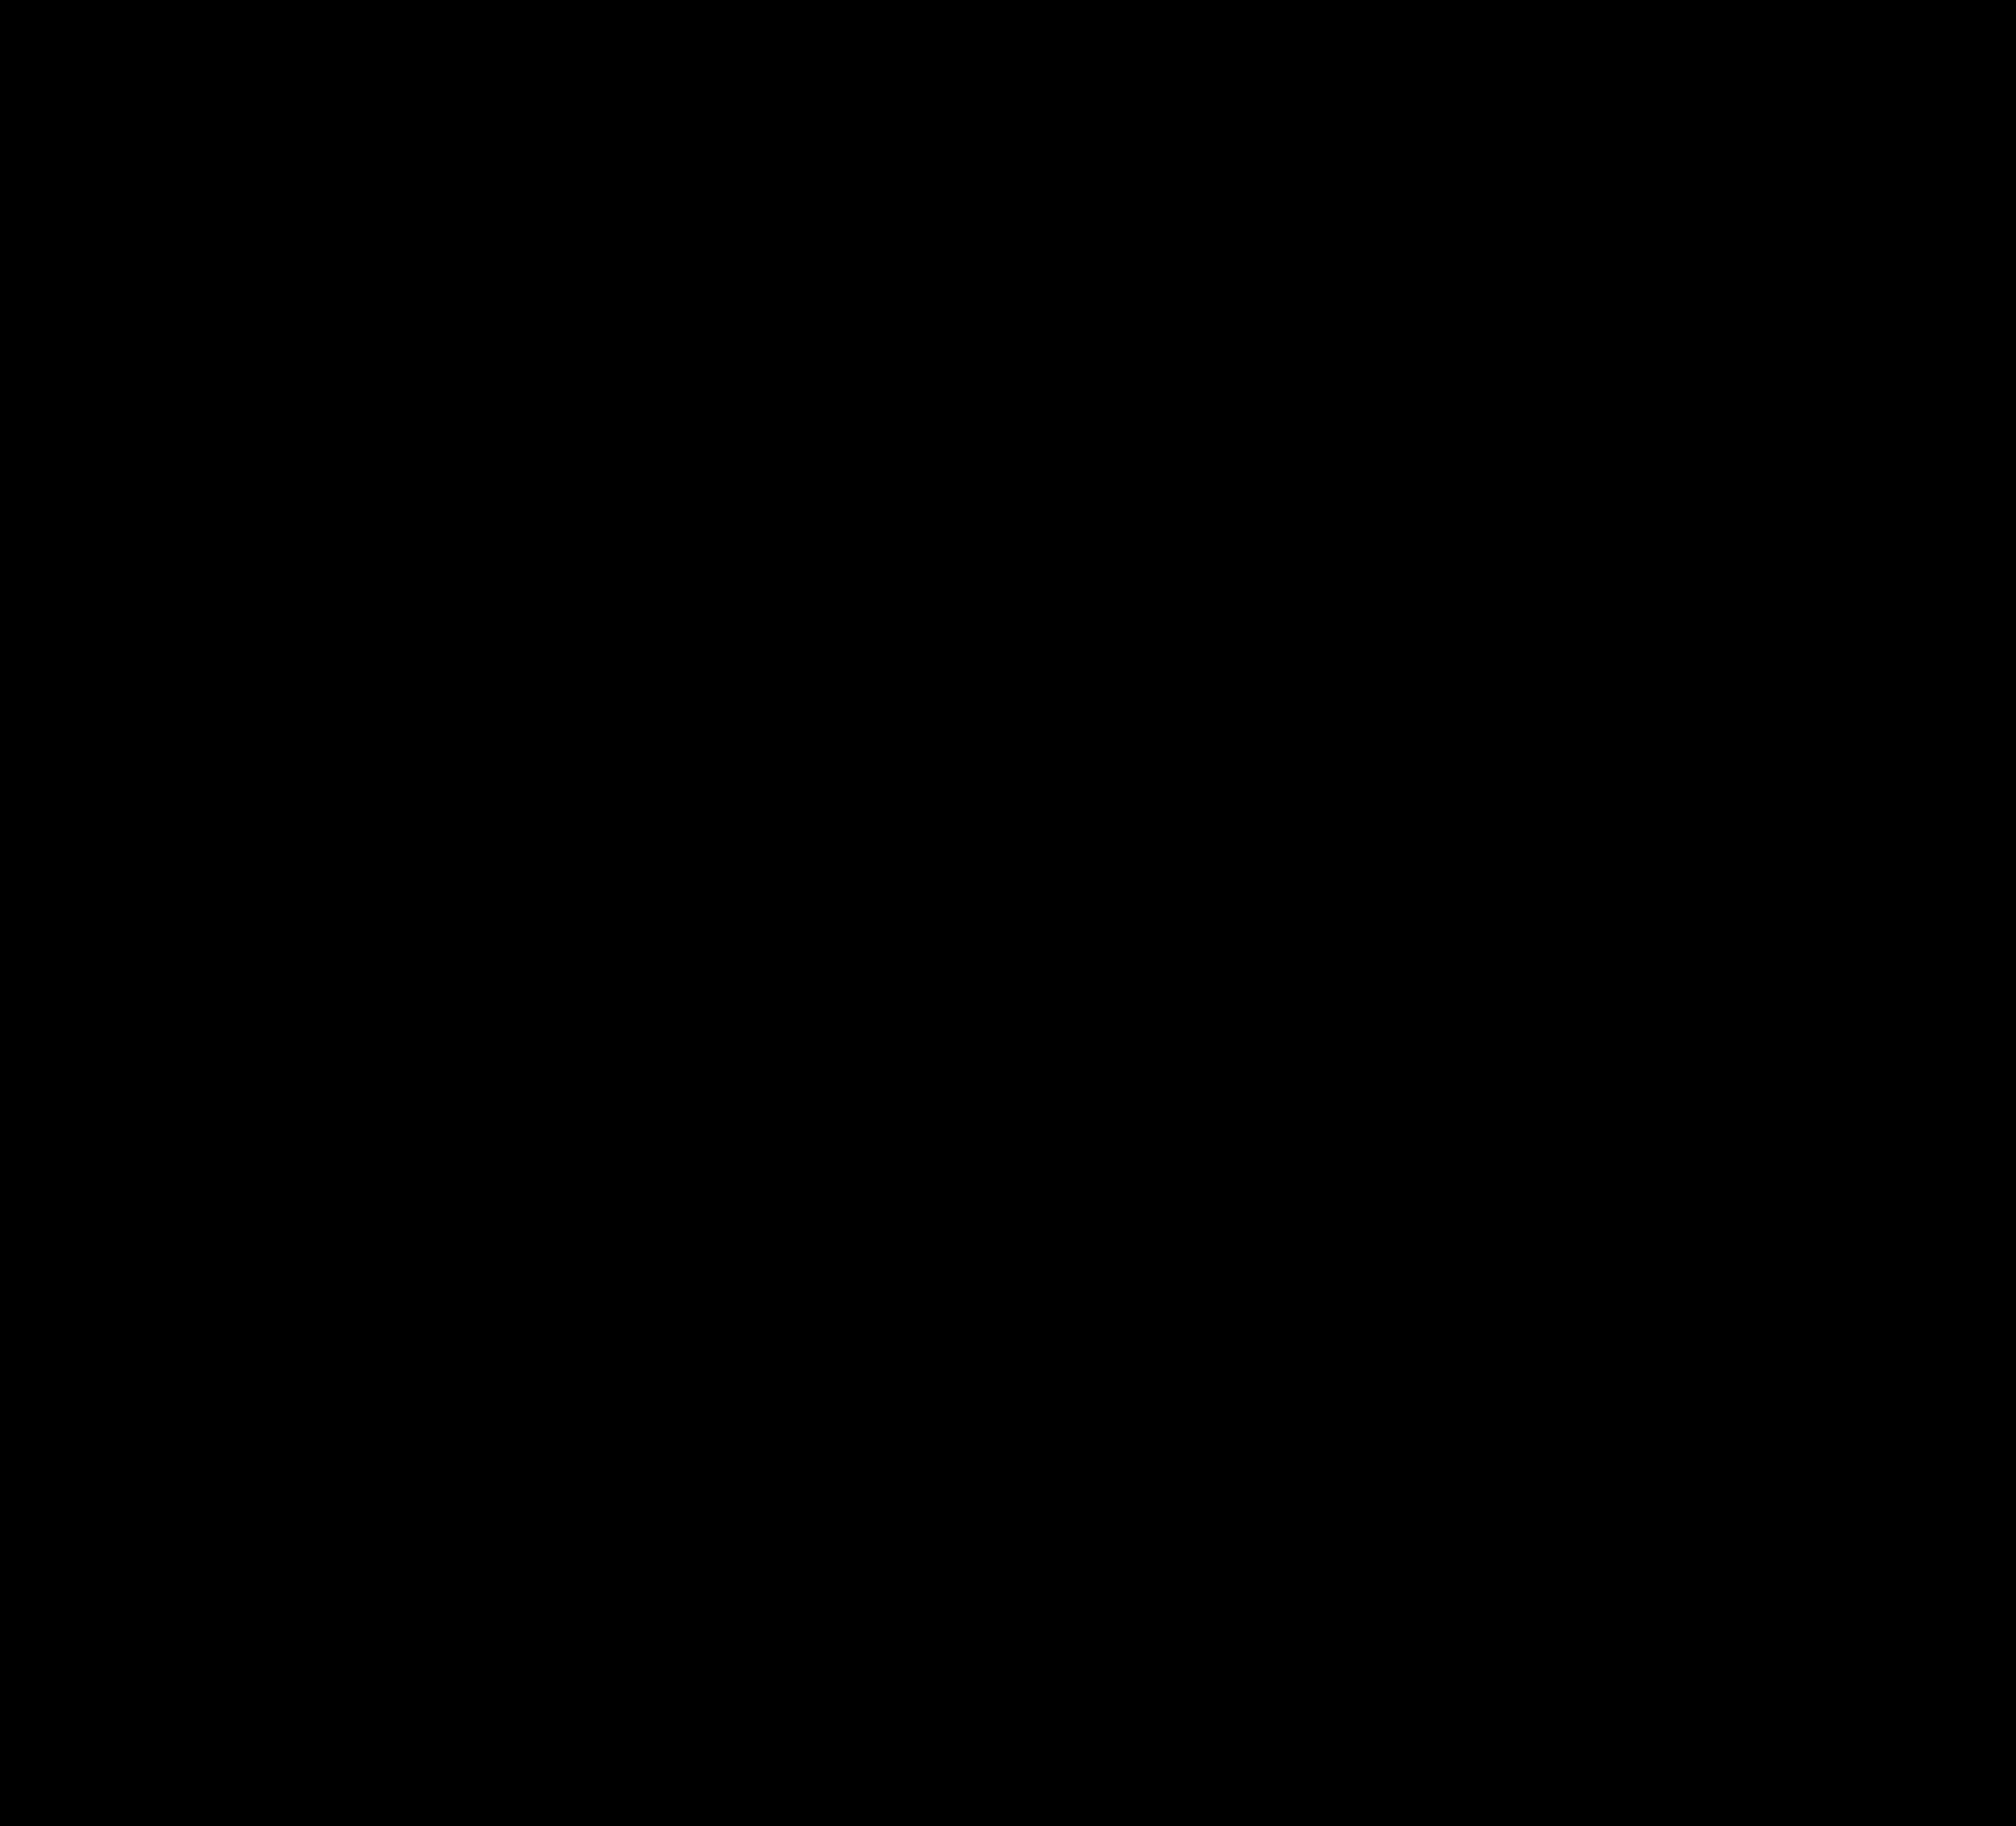 summerspace_logo_noBG-05.png